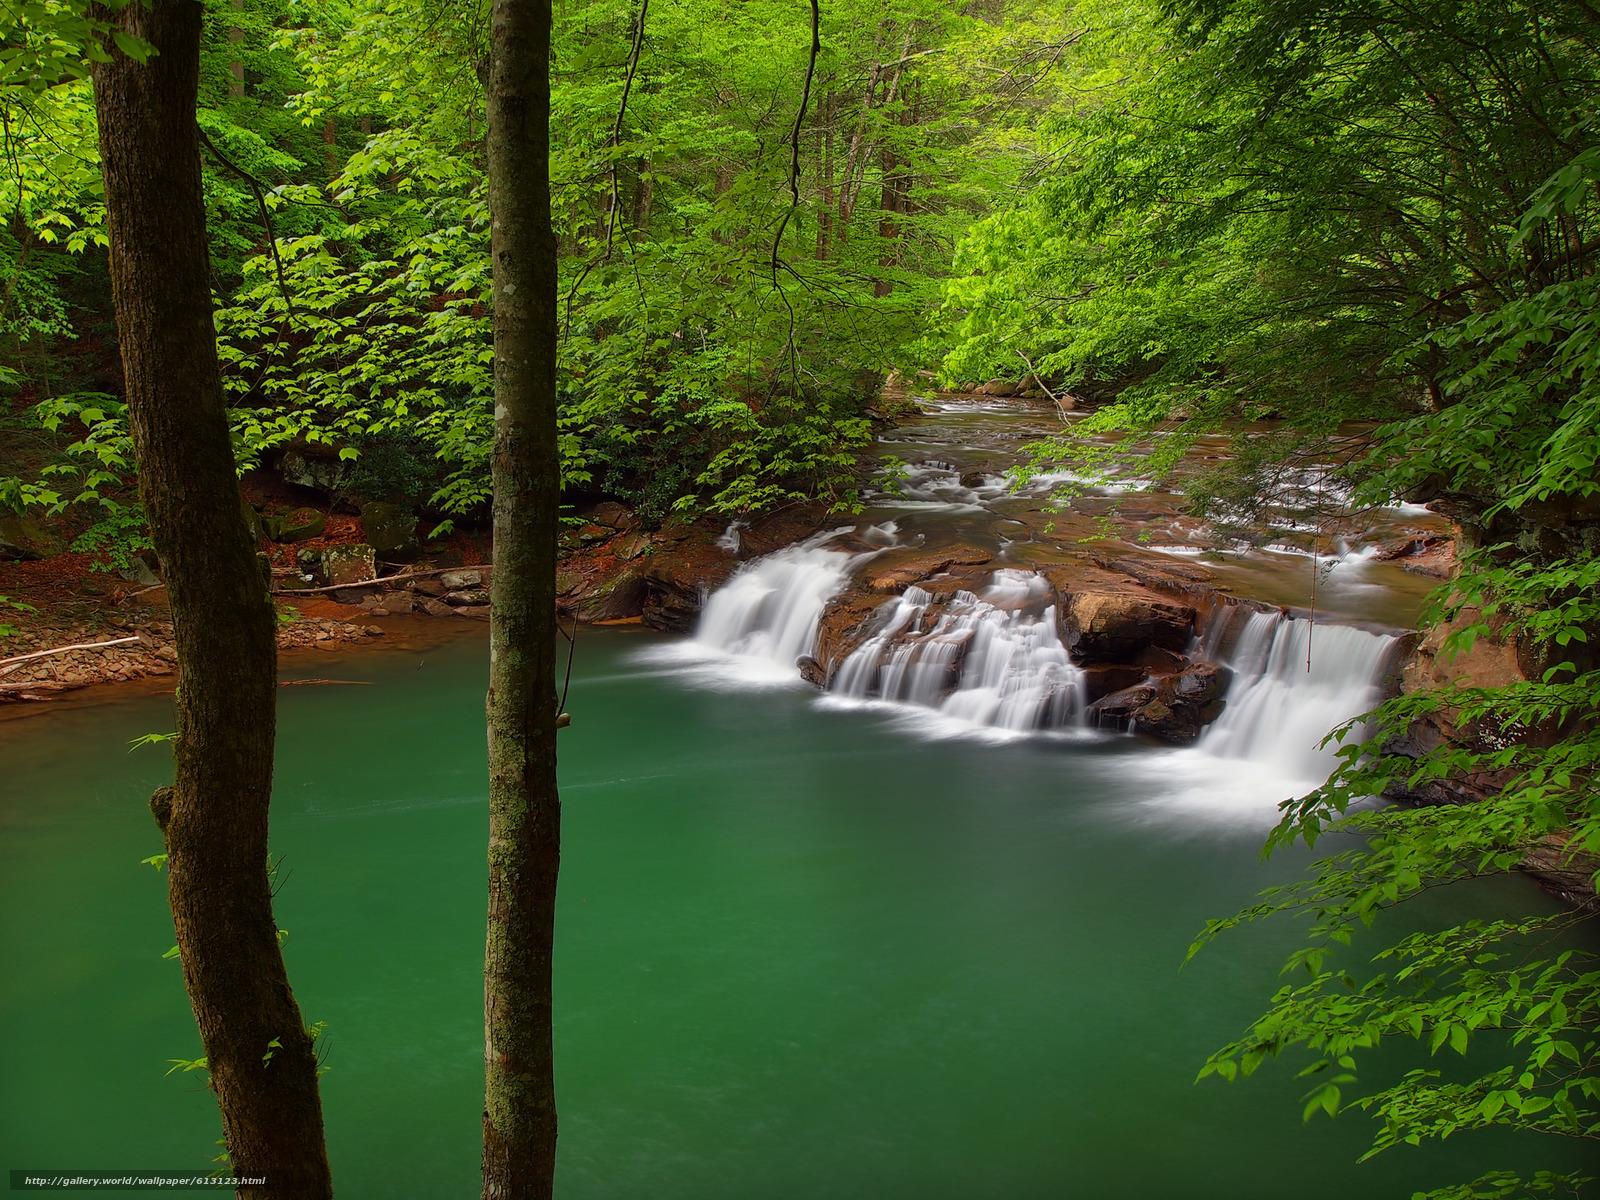 Download Wallpaper Lower Glade Creek Falls, New River - Glade Creek New River Gorge - HD Wallpaper